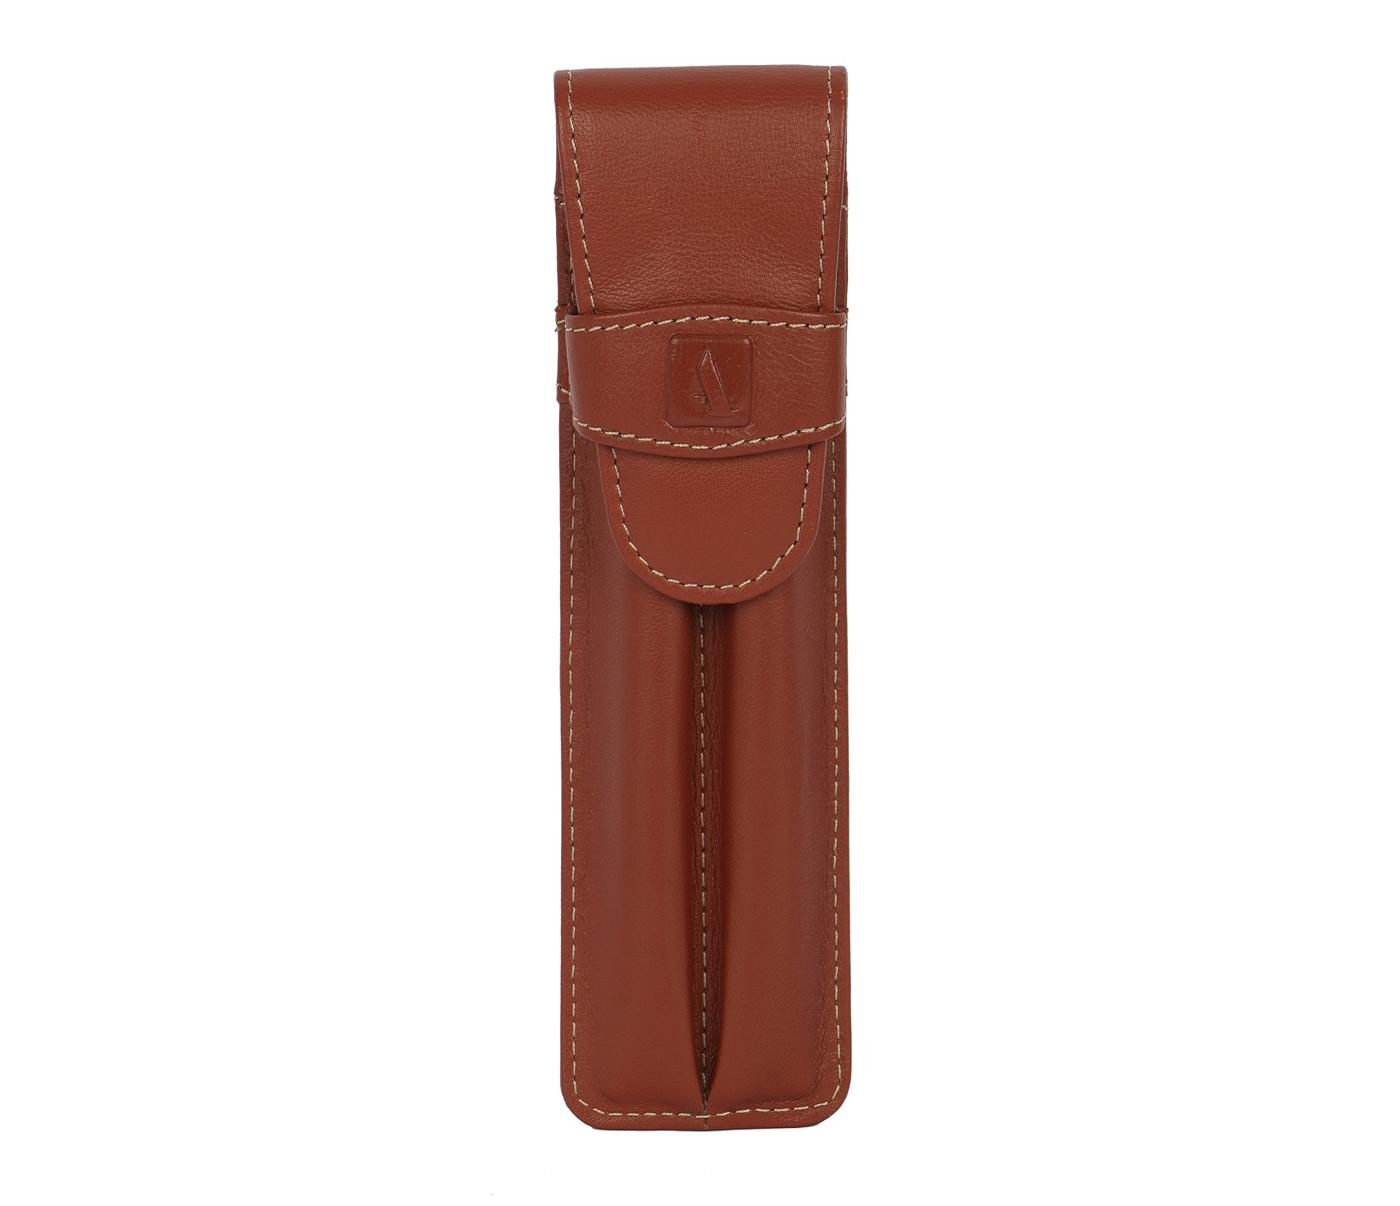 Leather Pen Case(Tan)W51